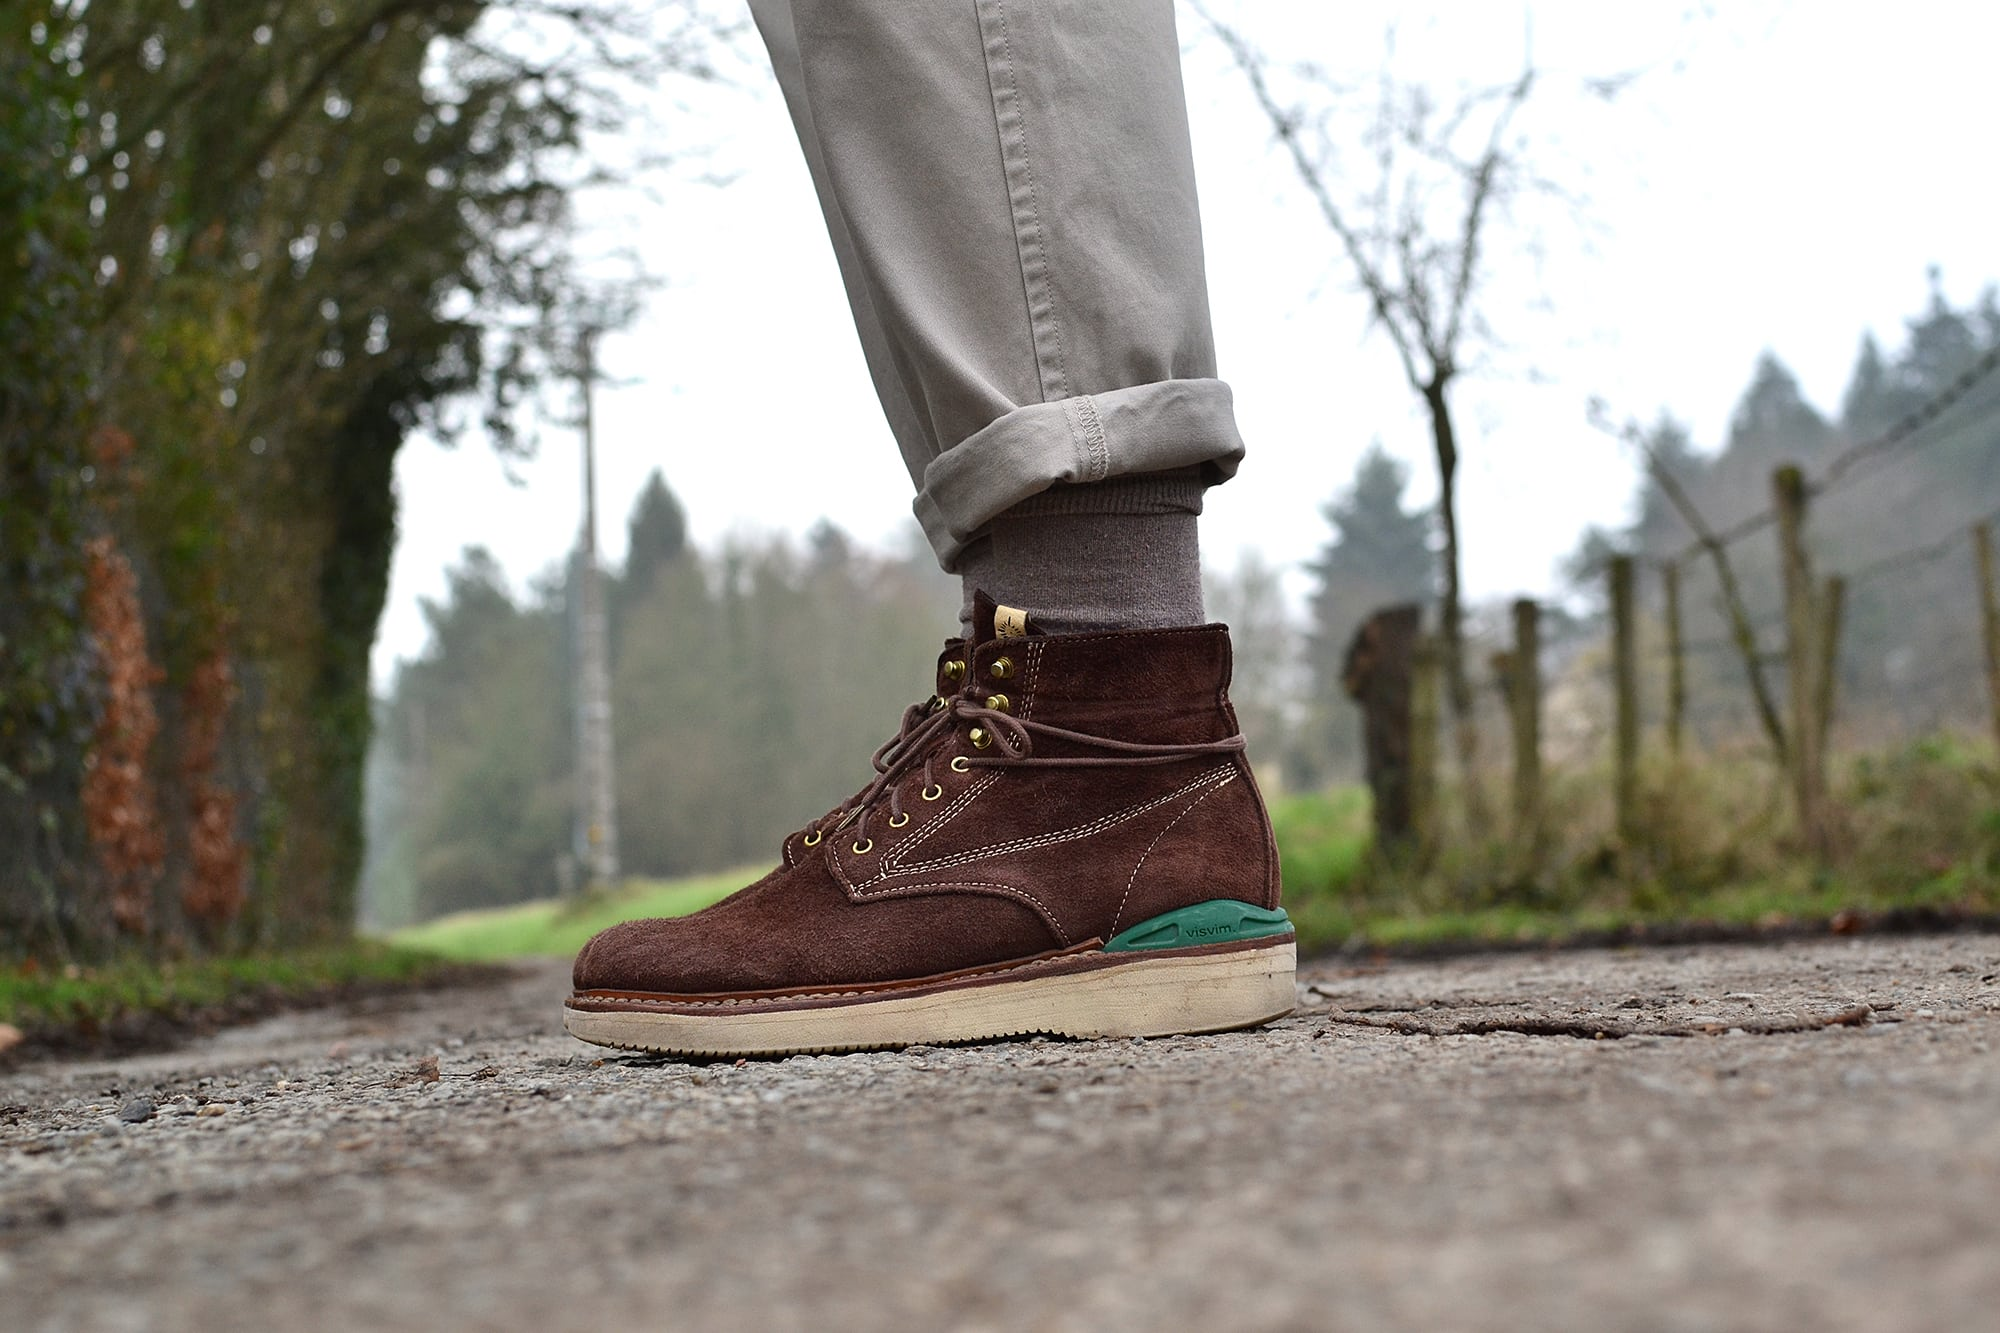 How to wear work boots Visvim Virgil brown chocolate elk boots